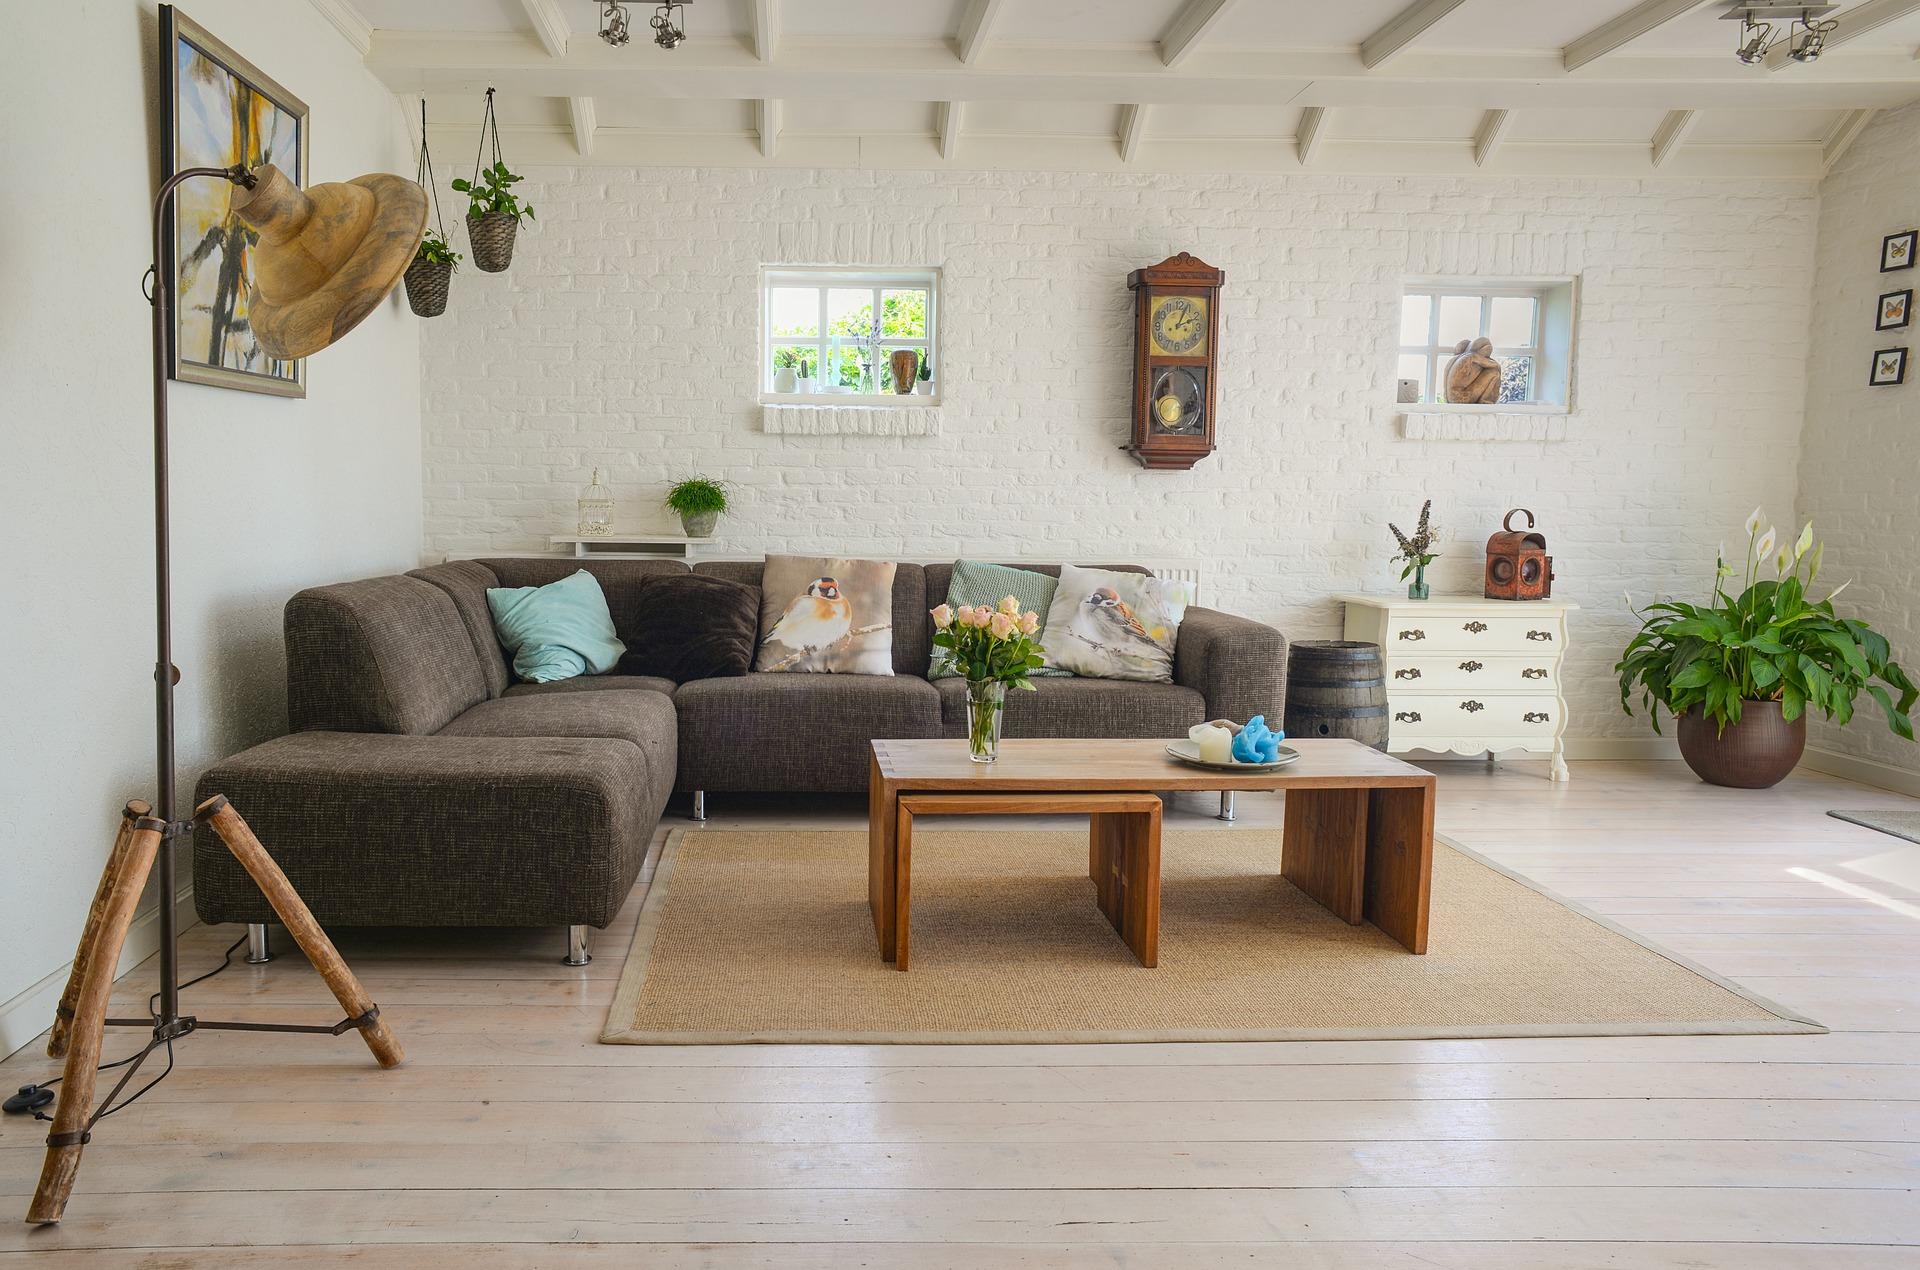 Arredare casa: 4 idee per renderla unica